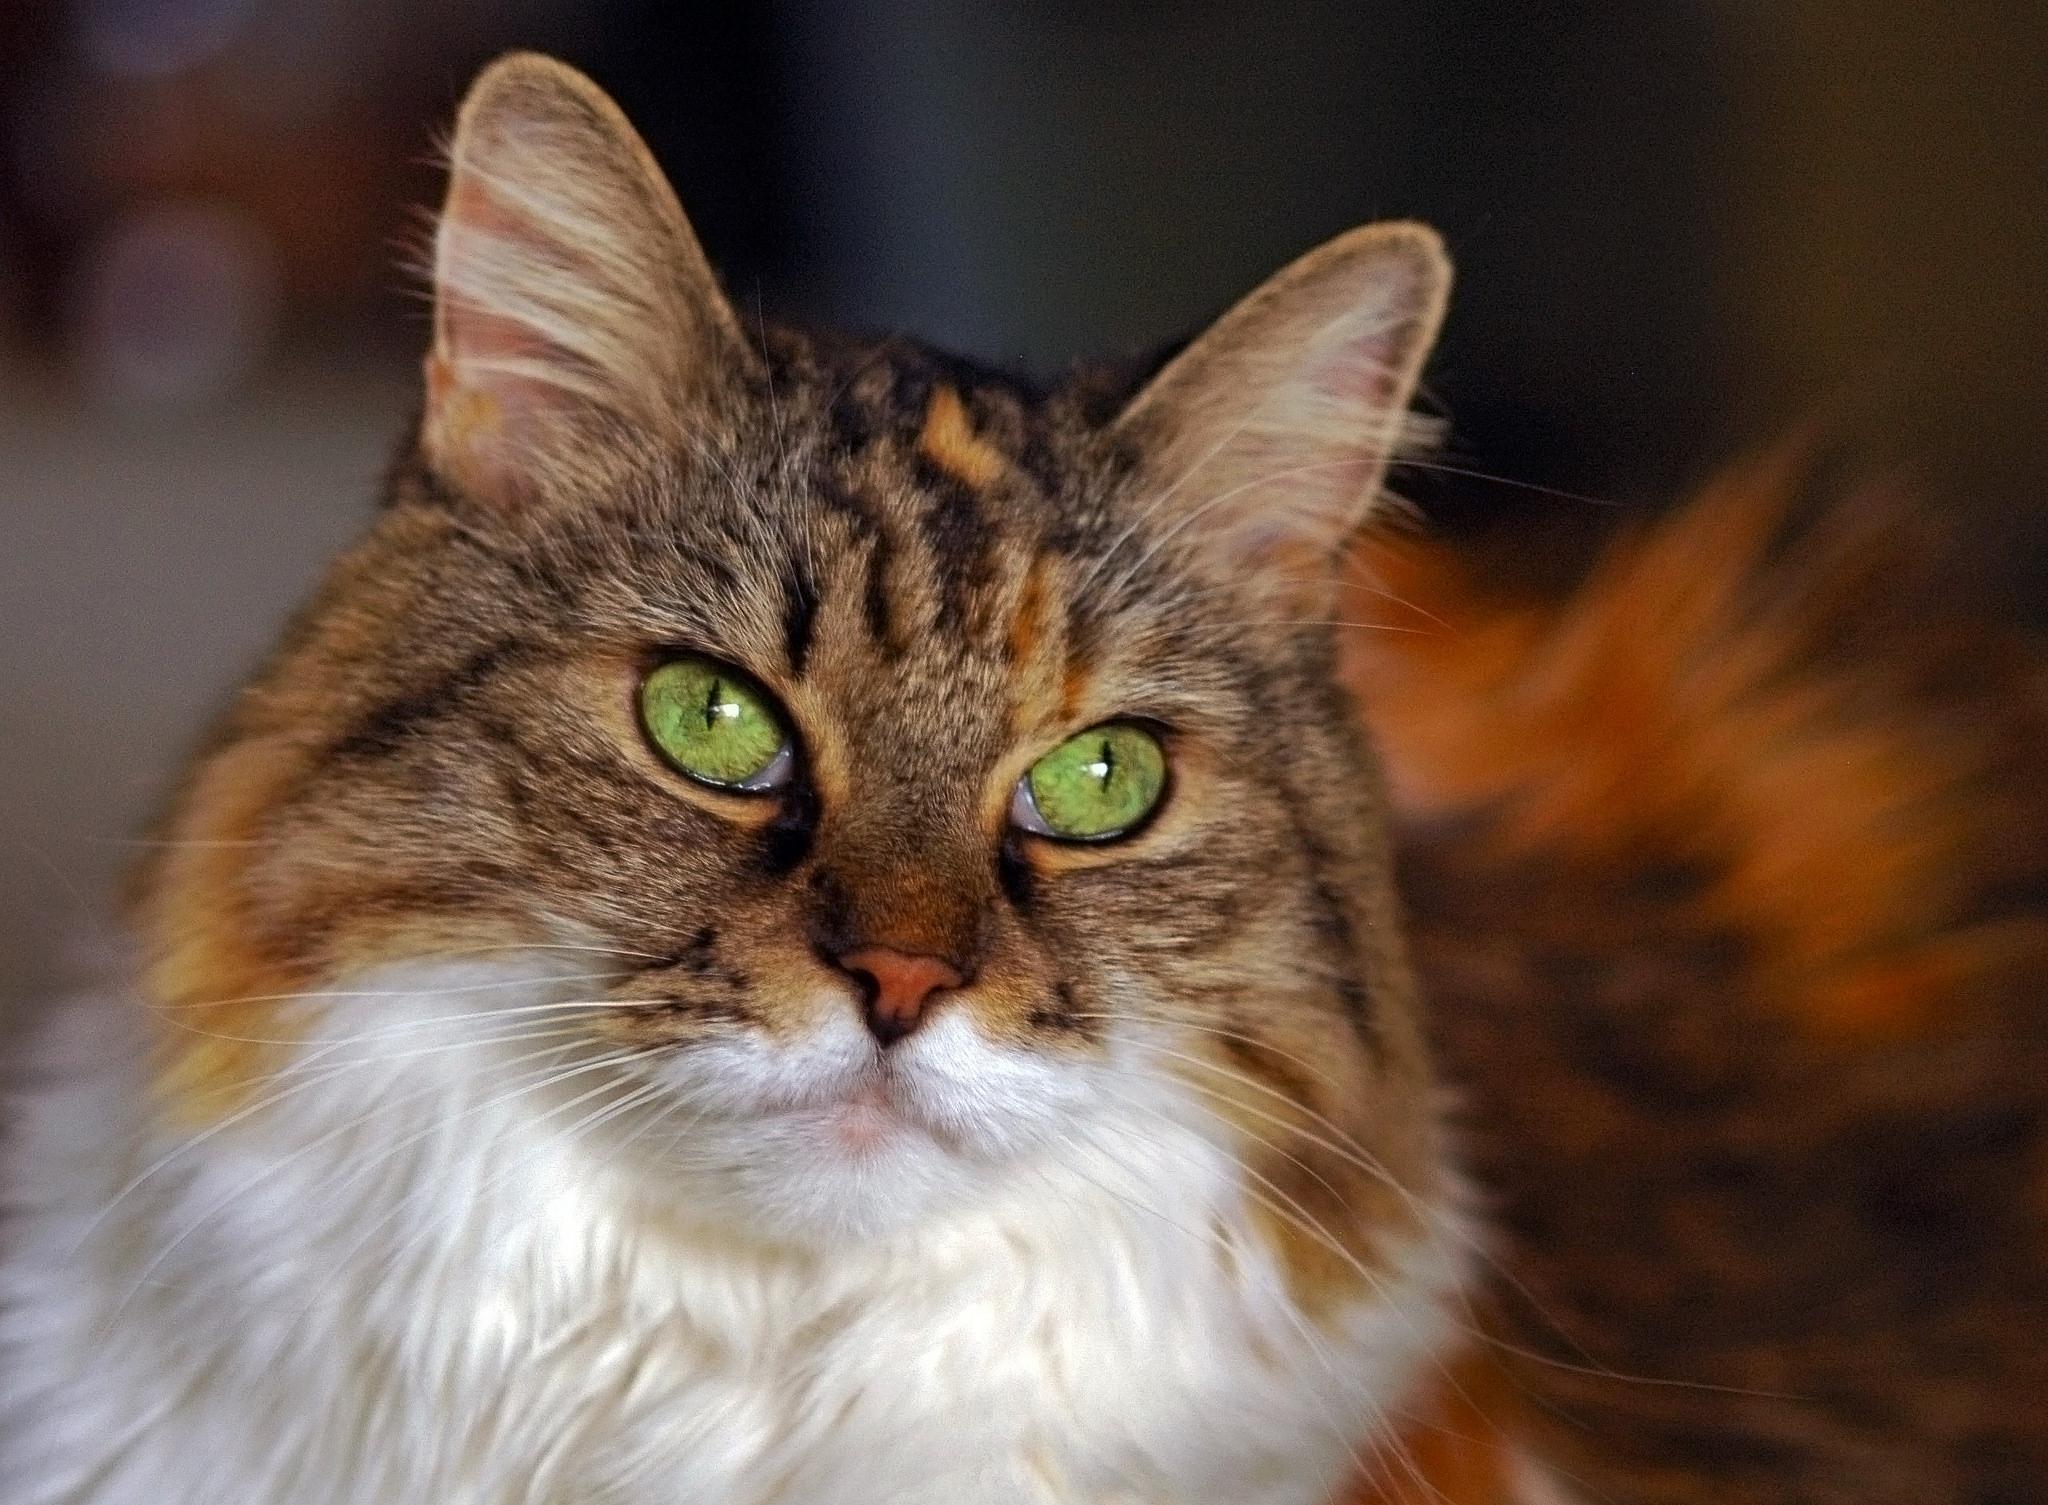 Gato ojos verdes - 2048x1505